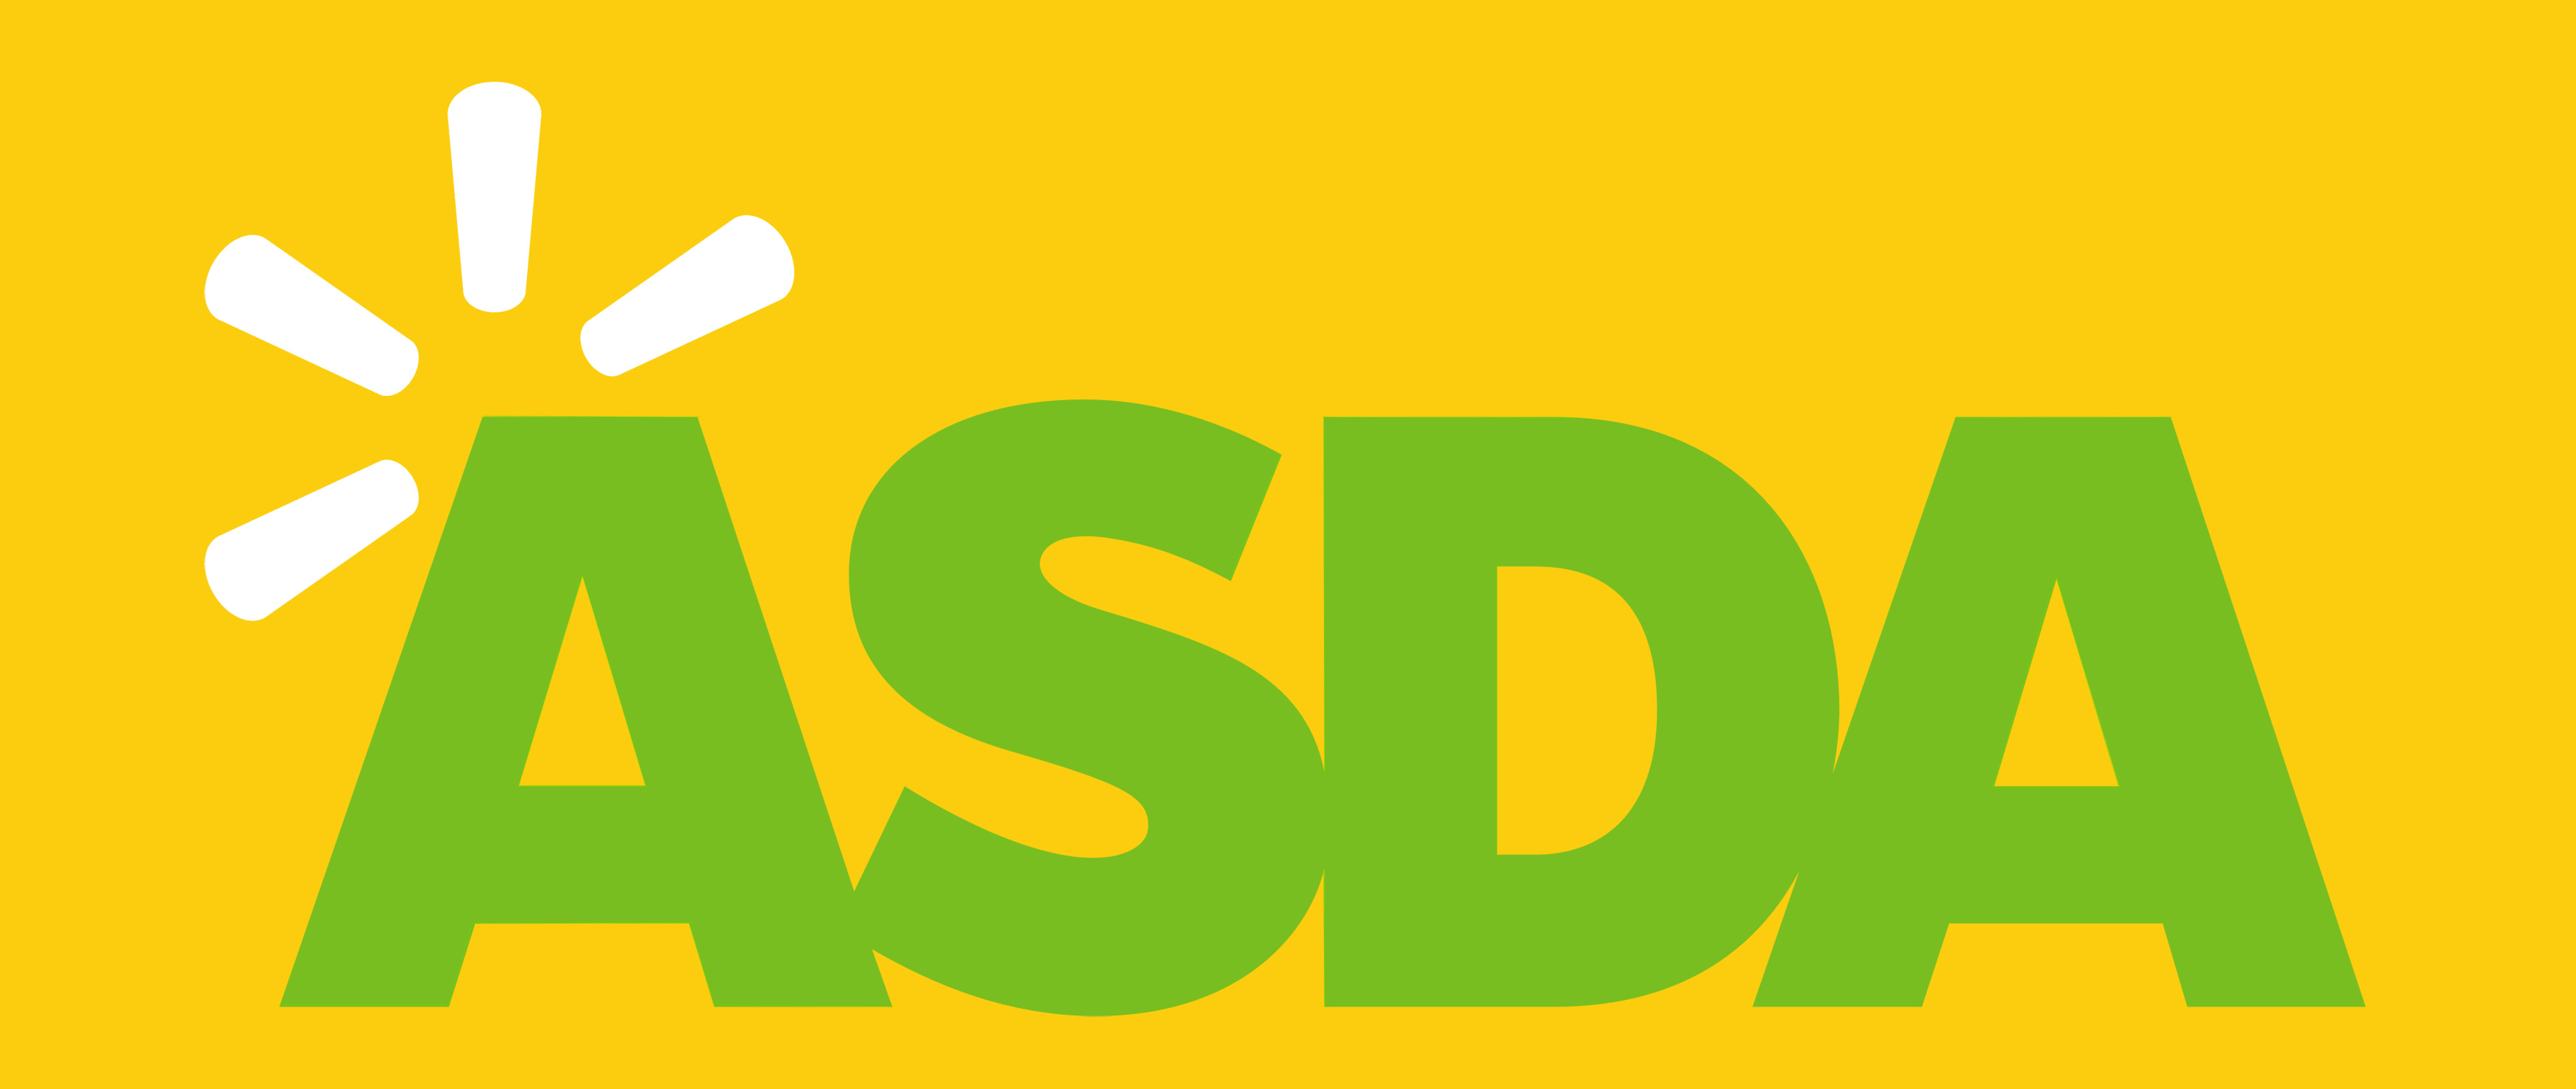 Asda Logo Asda Symbol Meaning History And Evolution